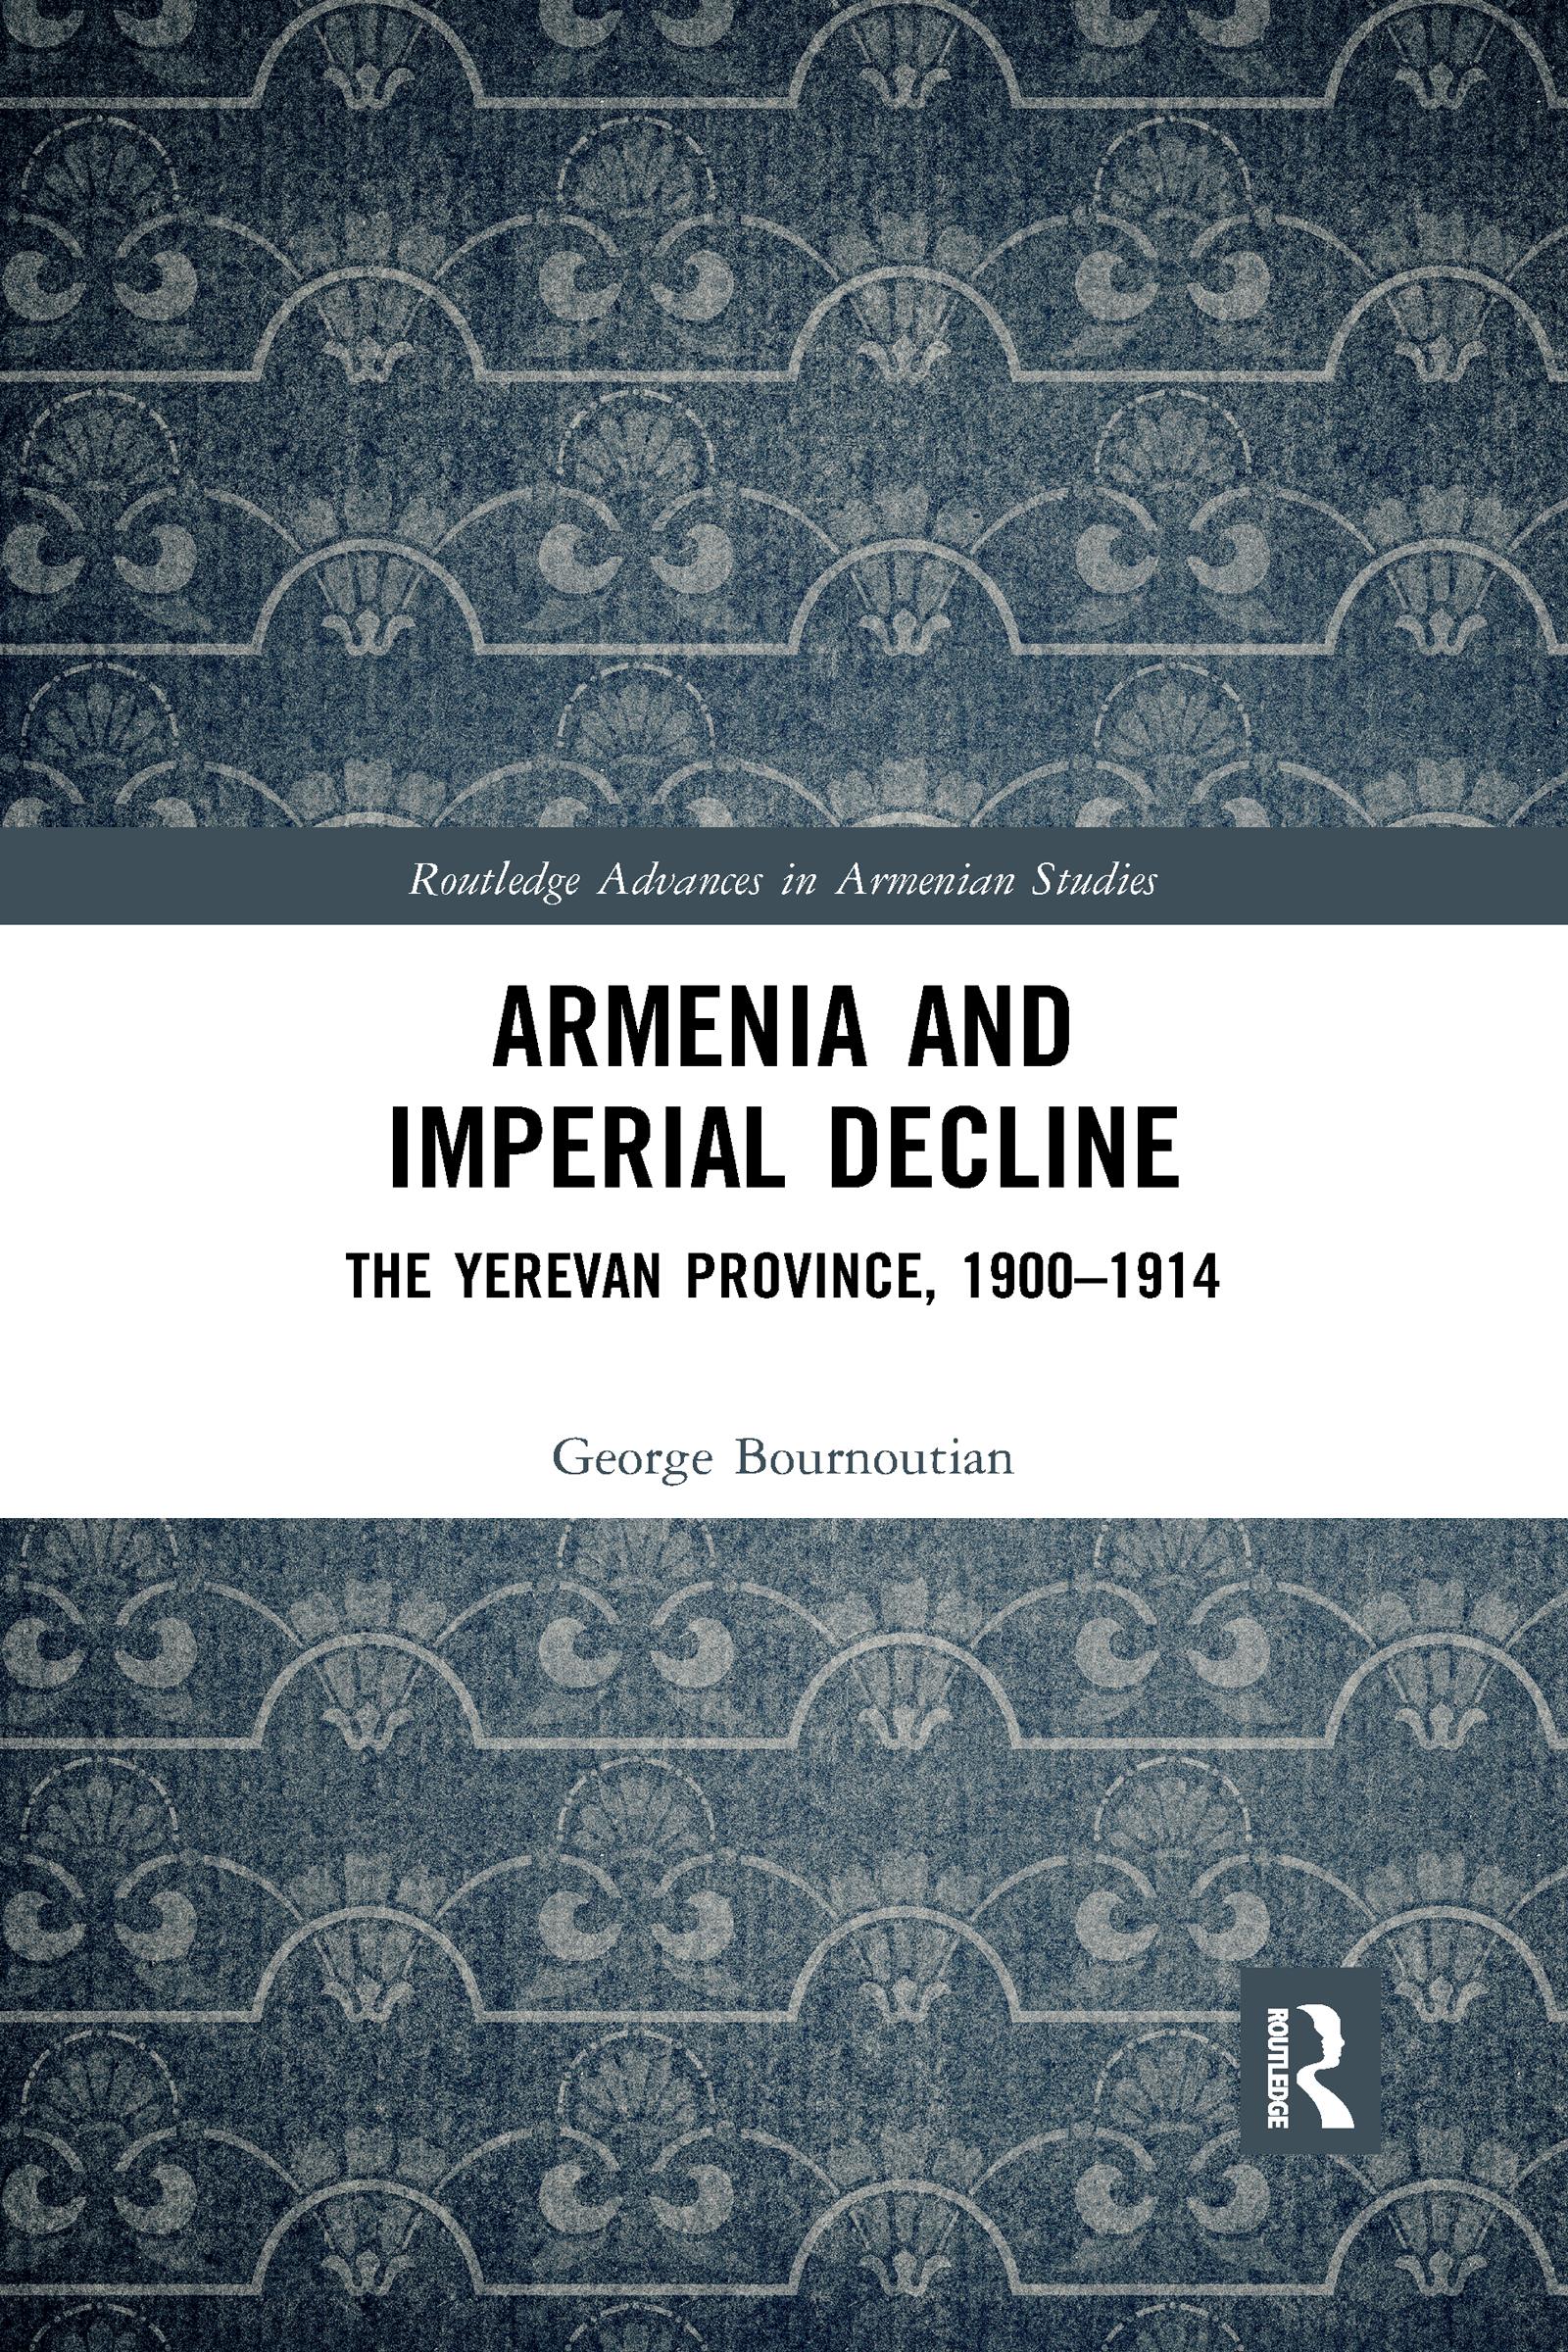 Armenia and Imperial Decline